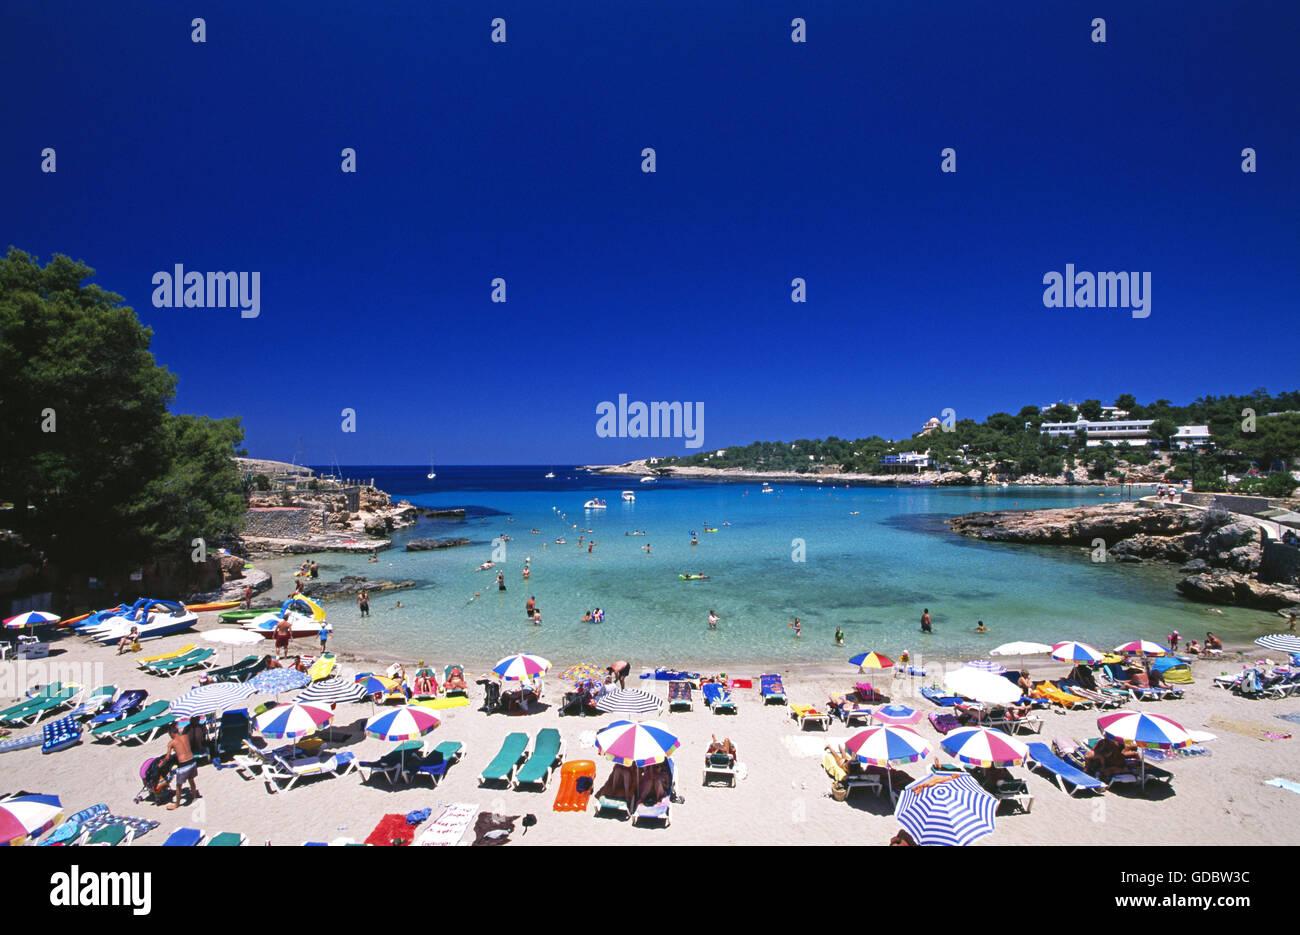 Cala Benirras, Ibiza, Balearic Islands, Spain - Stock Image